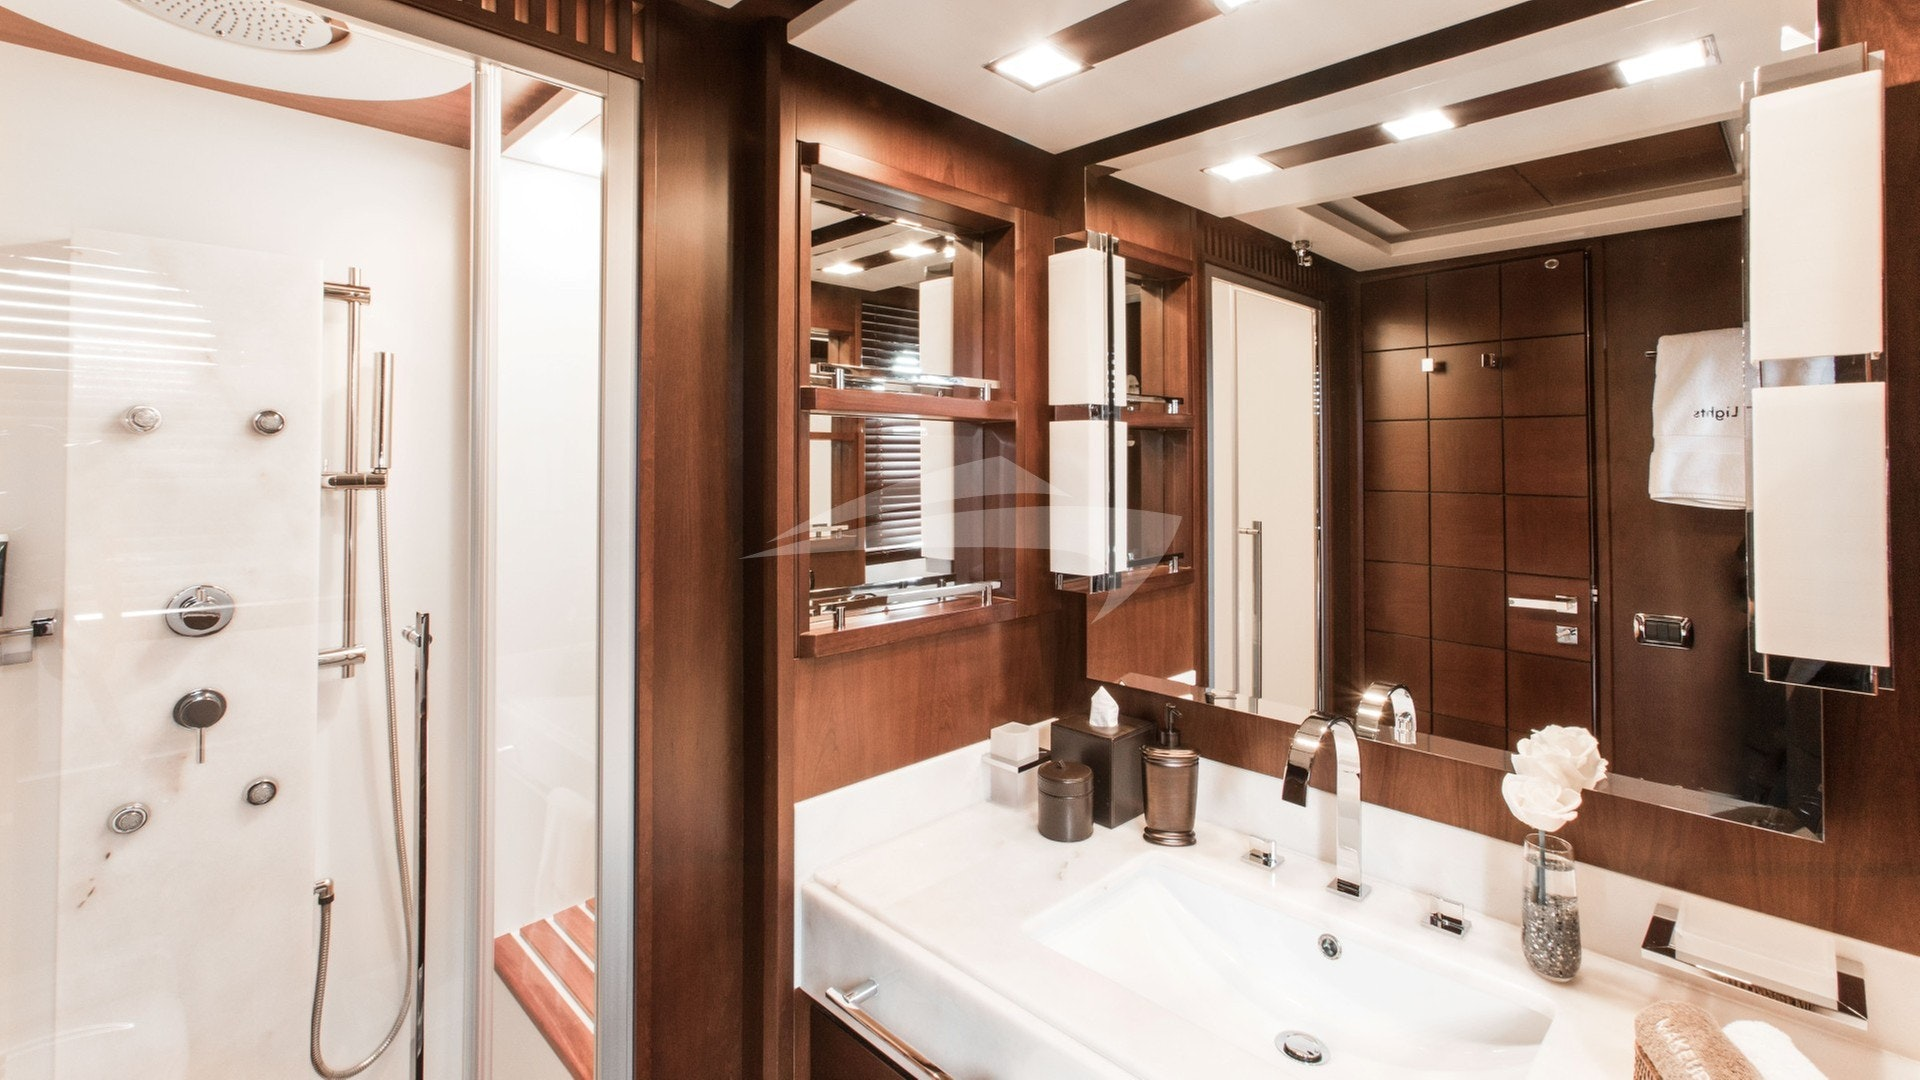 Guest Cabin En suite w/ Jet Shower